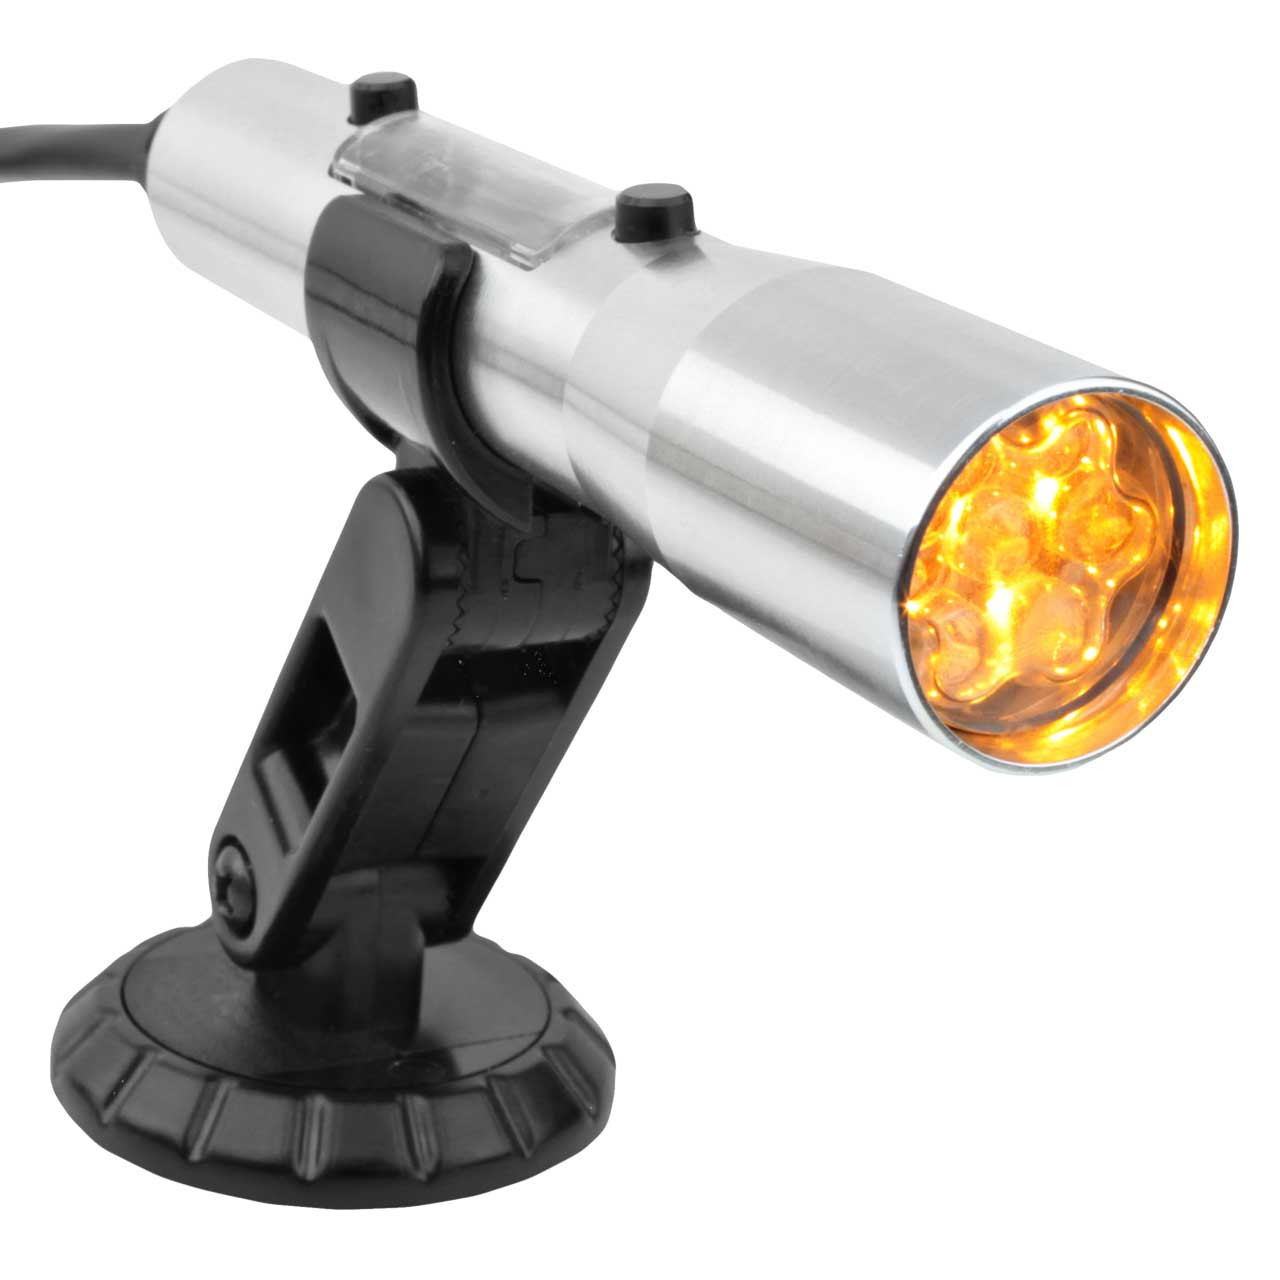 SST Shift Light - Yellow LEDs with Silver Aluminum Tube (Smart-Shift Technology)